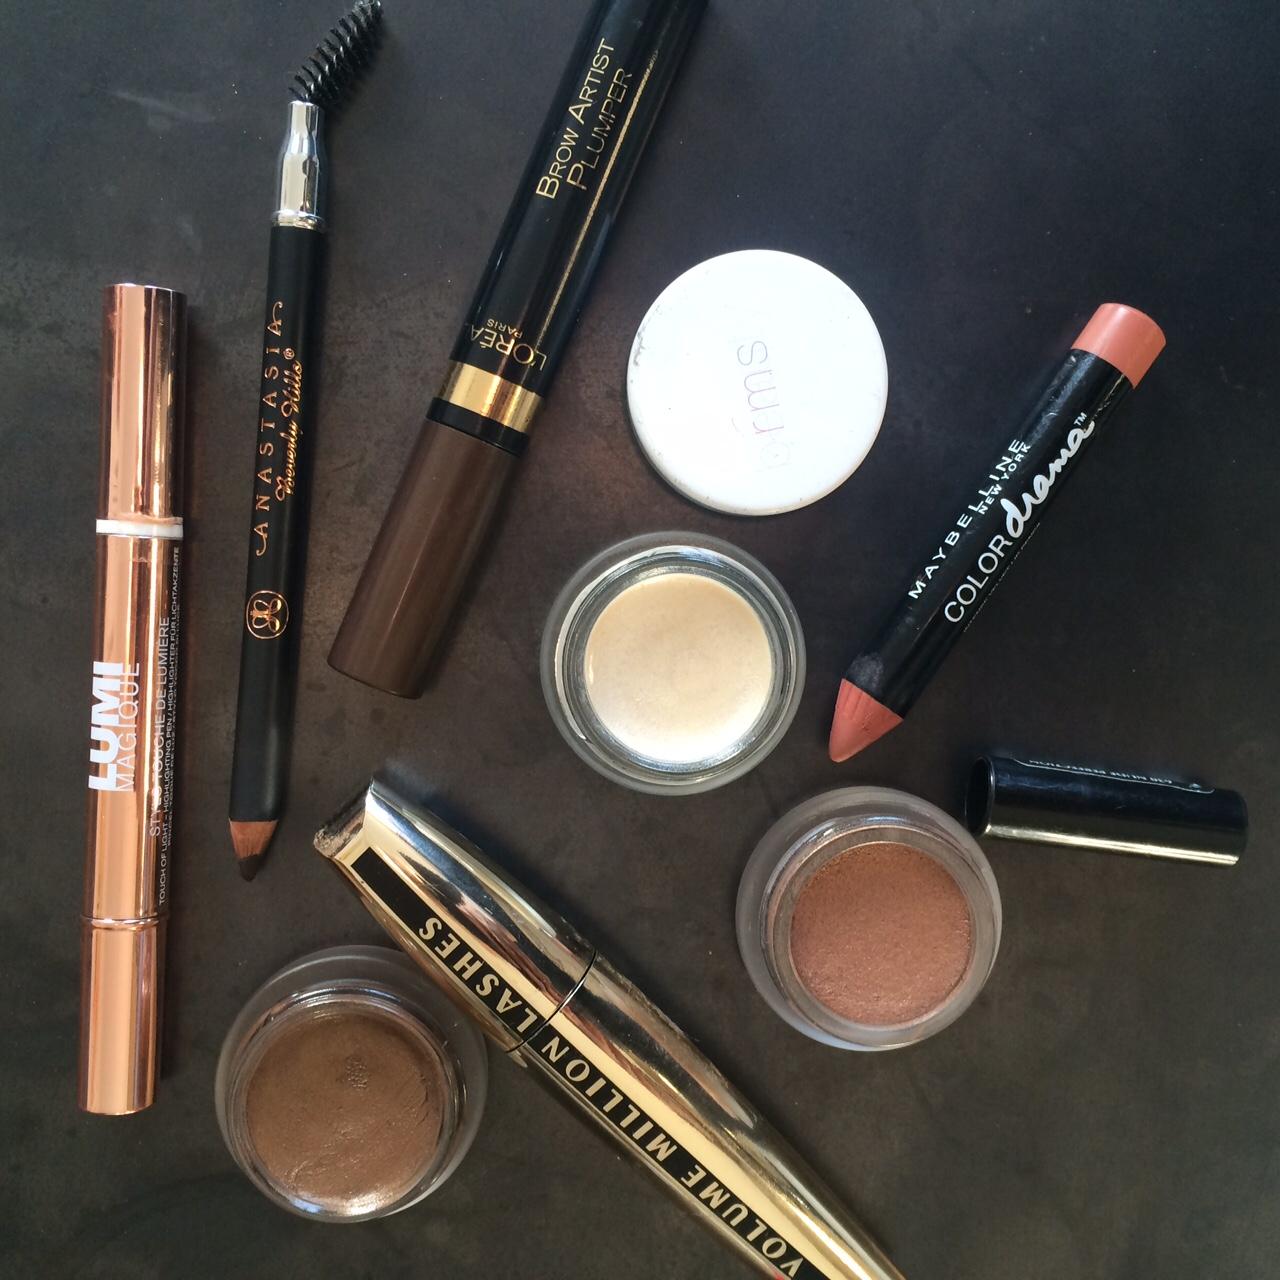 Pernille-teisbaek-makeup-artist-sara-rostrup-youblush